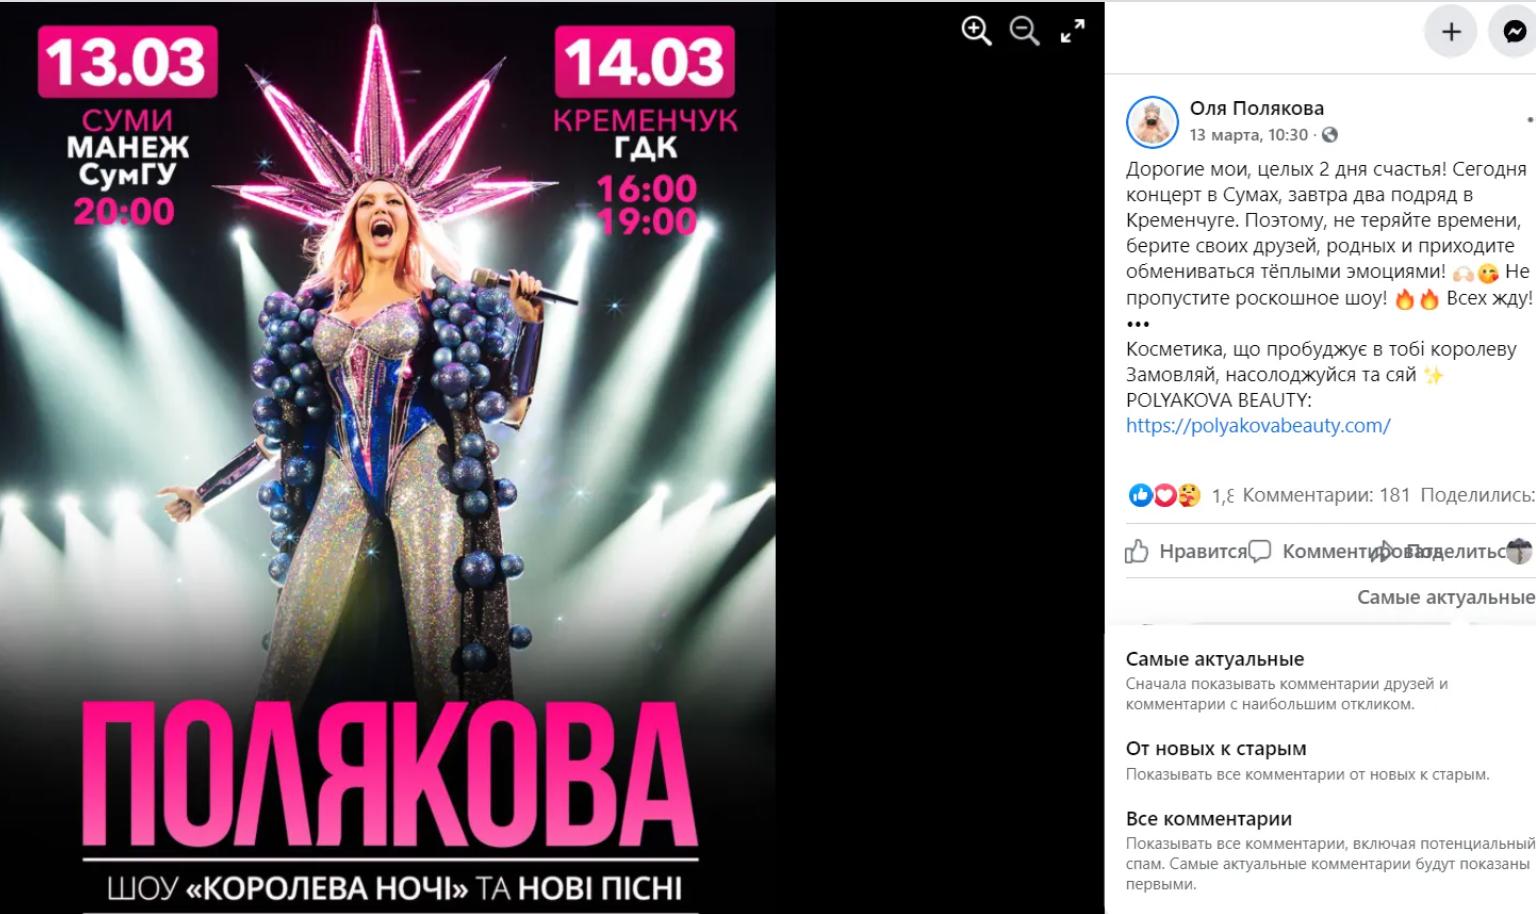 Полякова провела два концерта во время карантина: в Сумах (13 марта) и в Кременчуге (14 марта)